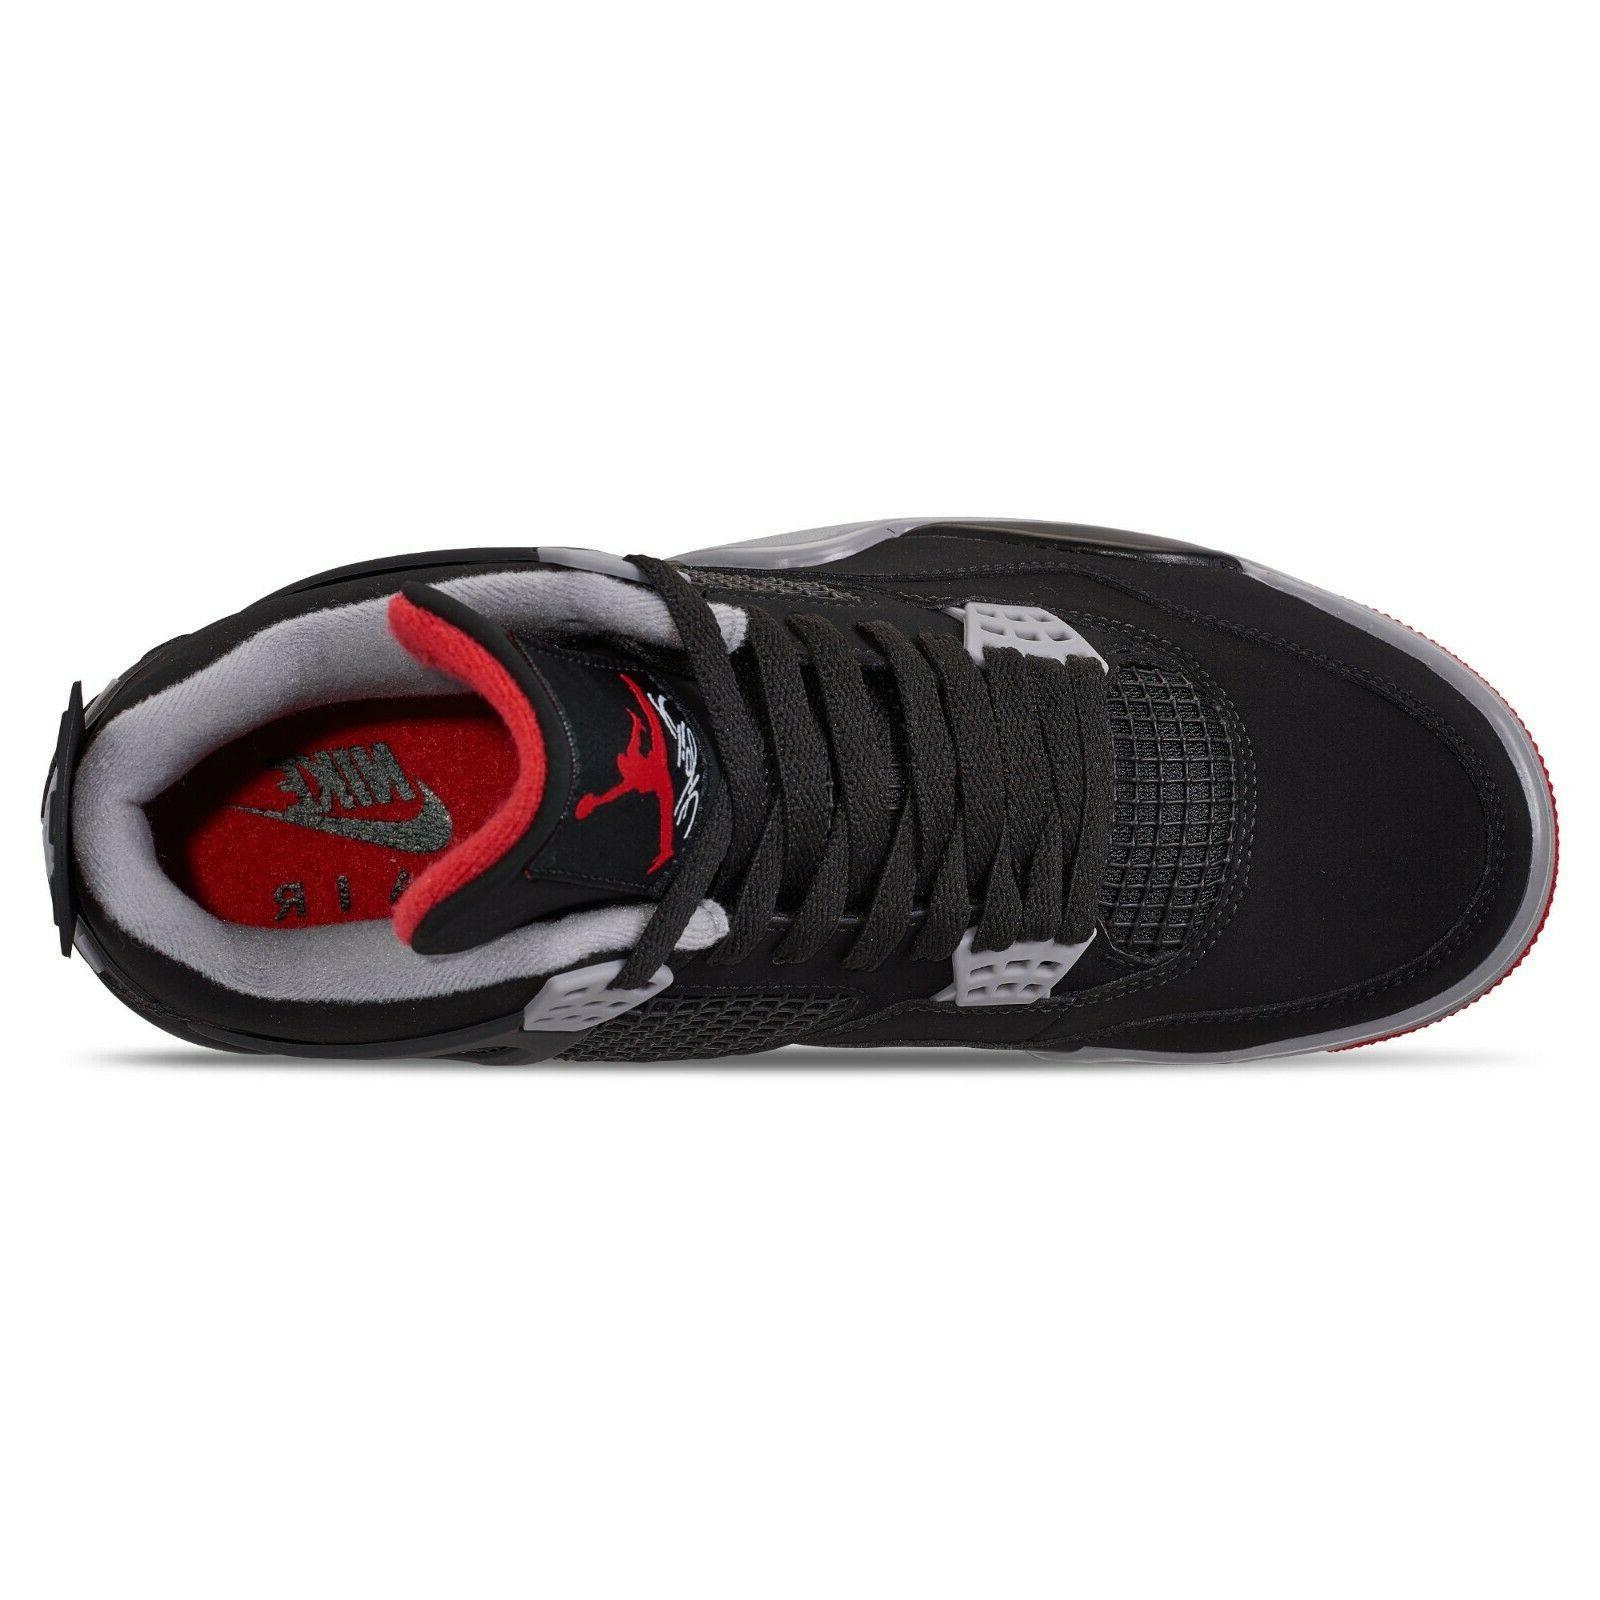 Air Jordan Retro Black Cement